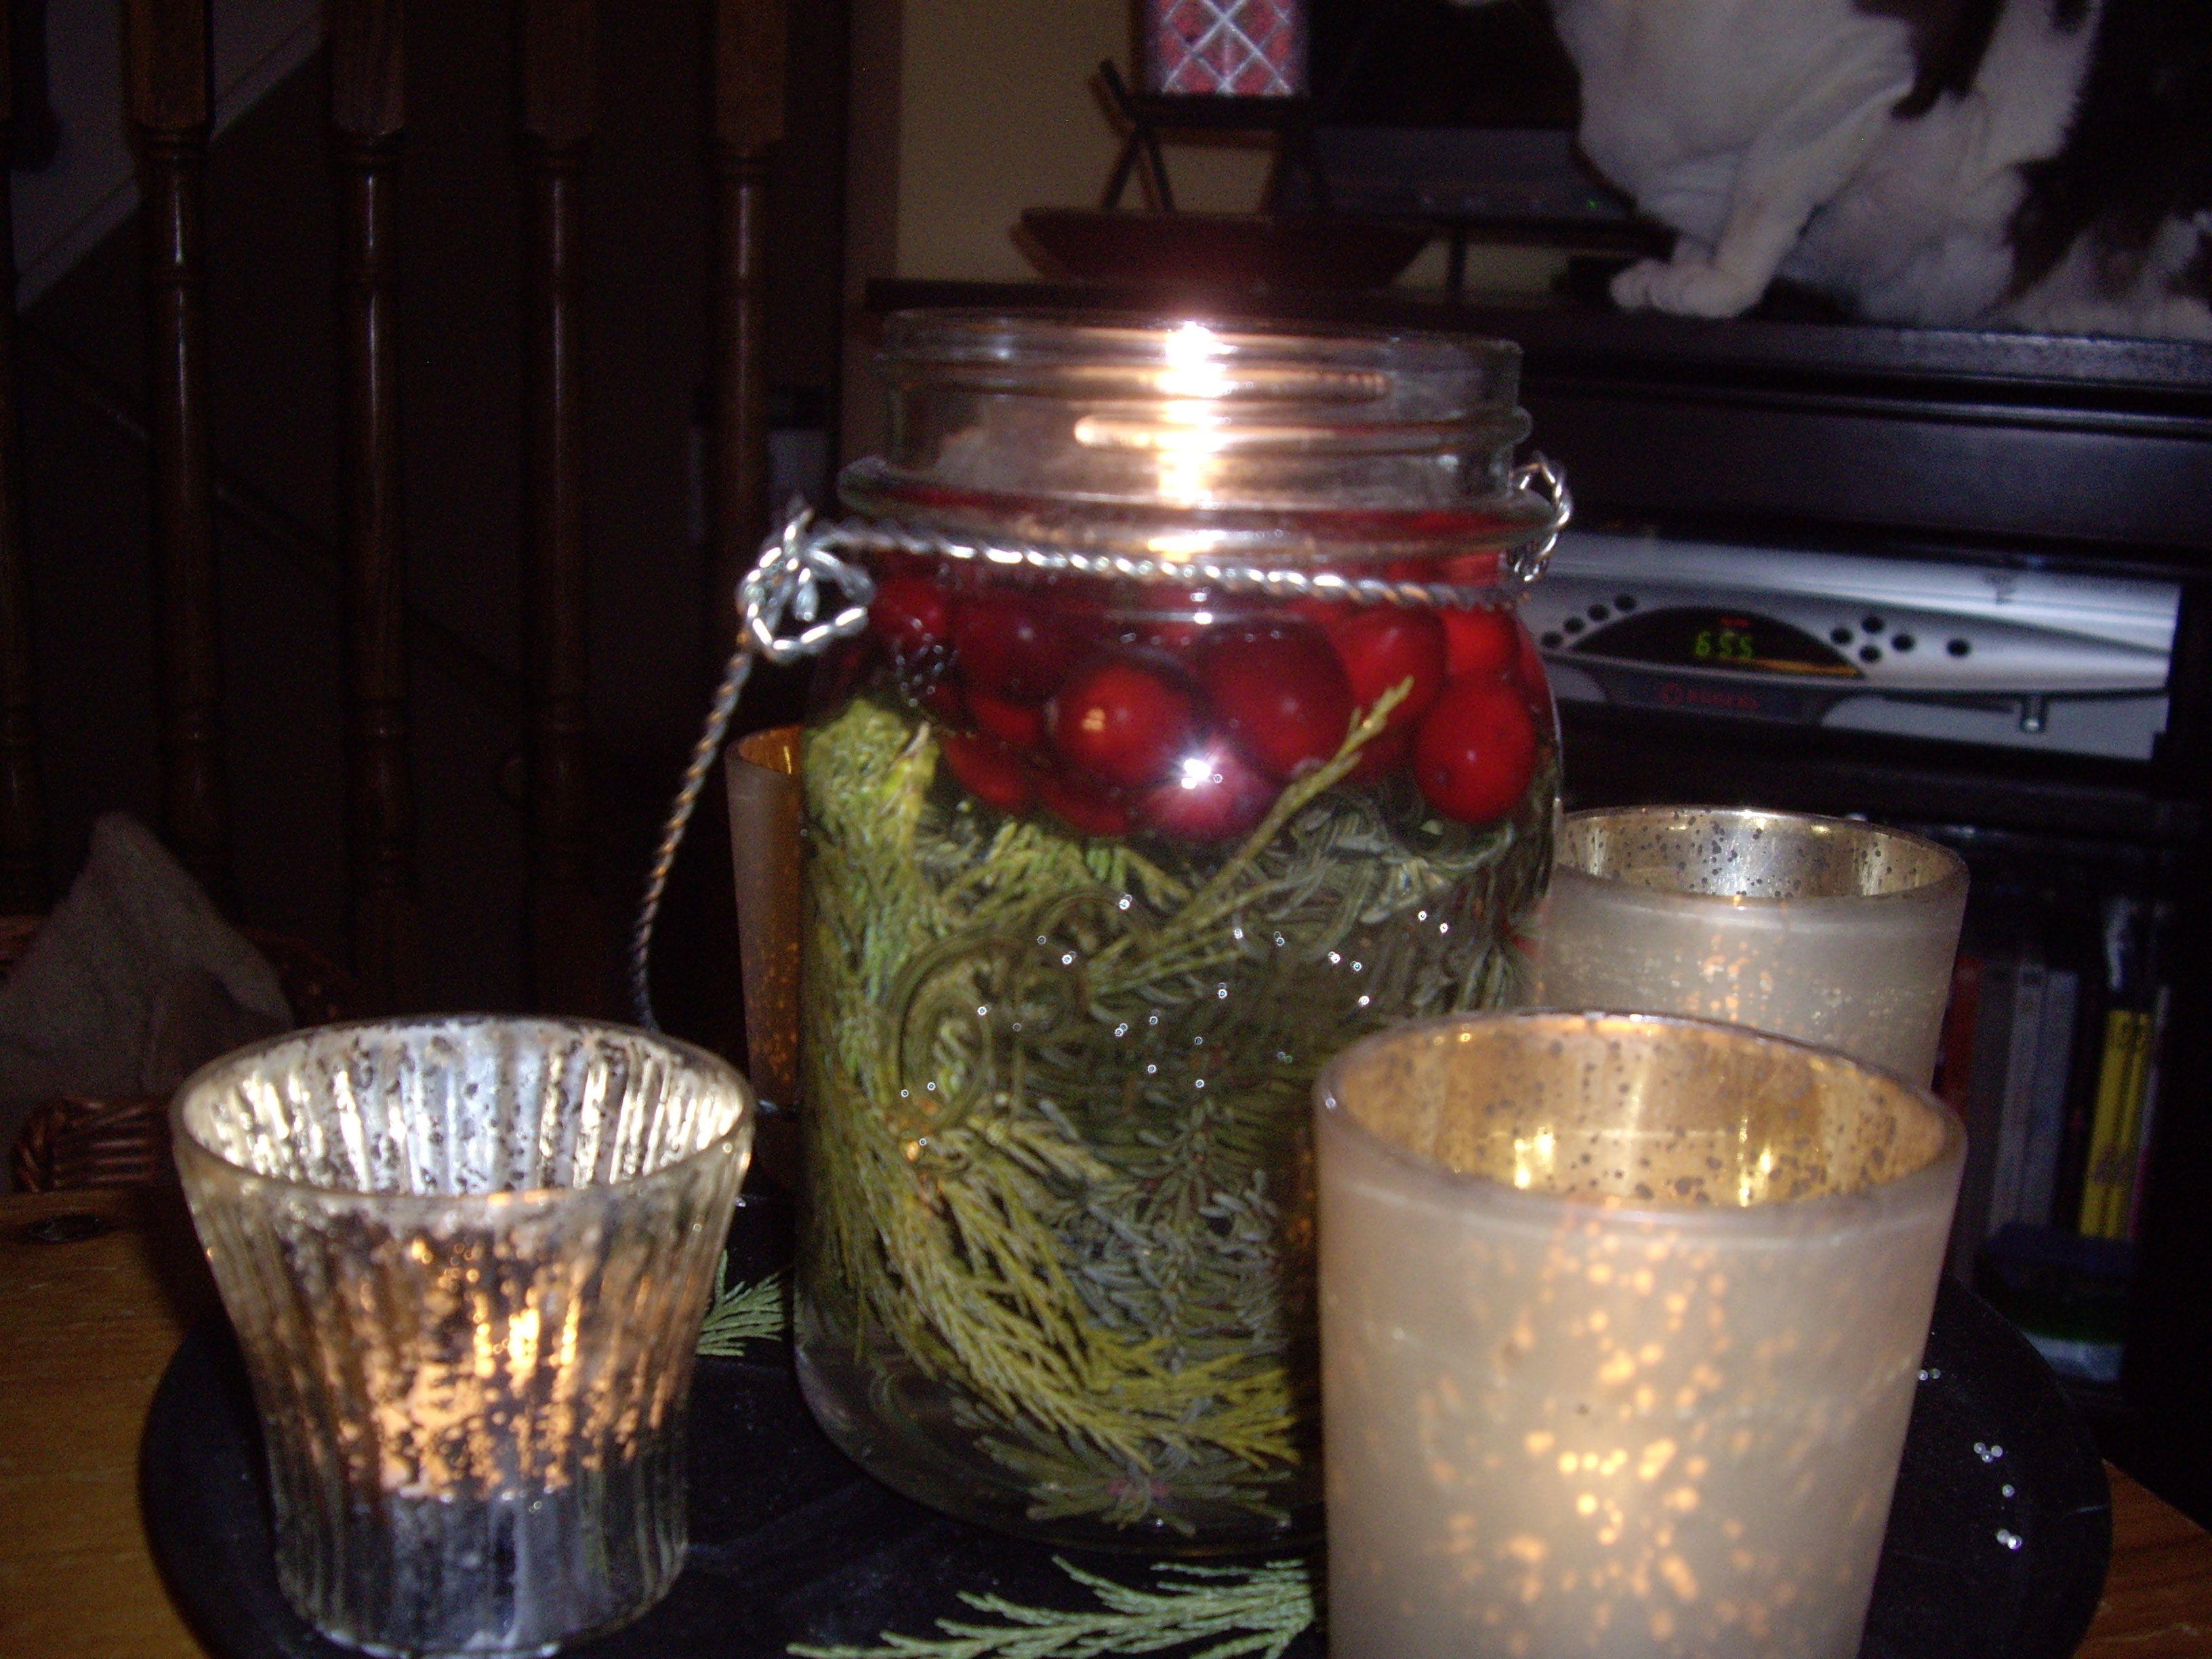 Mason Jar with Cranberries